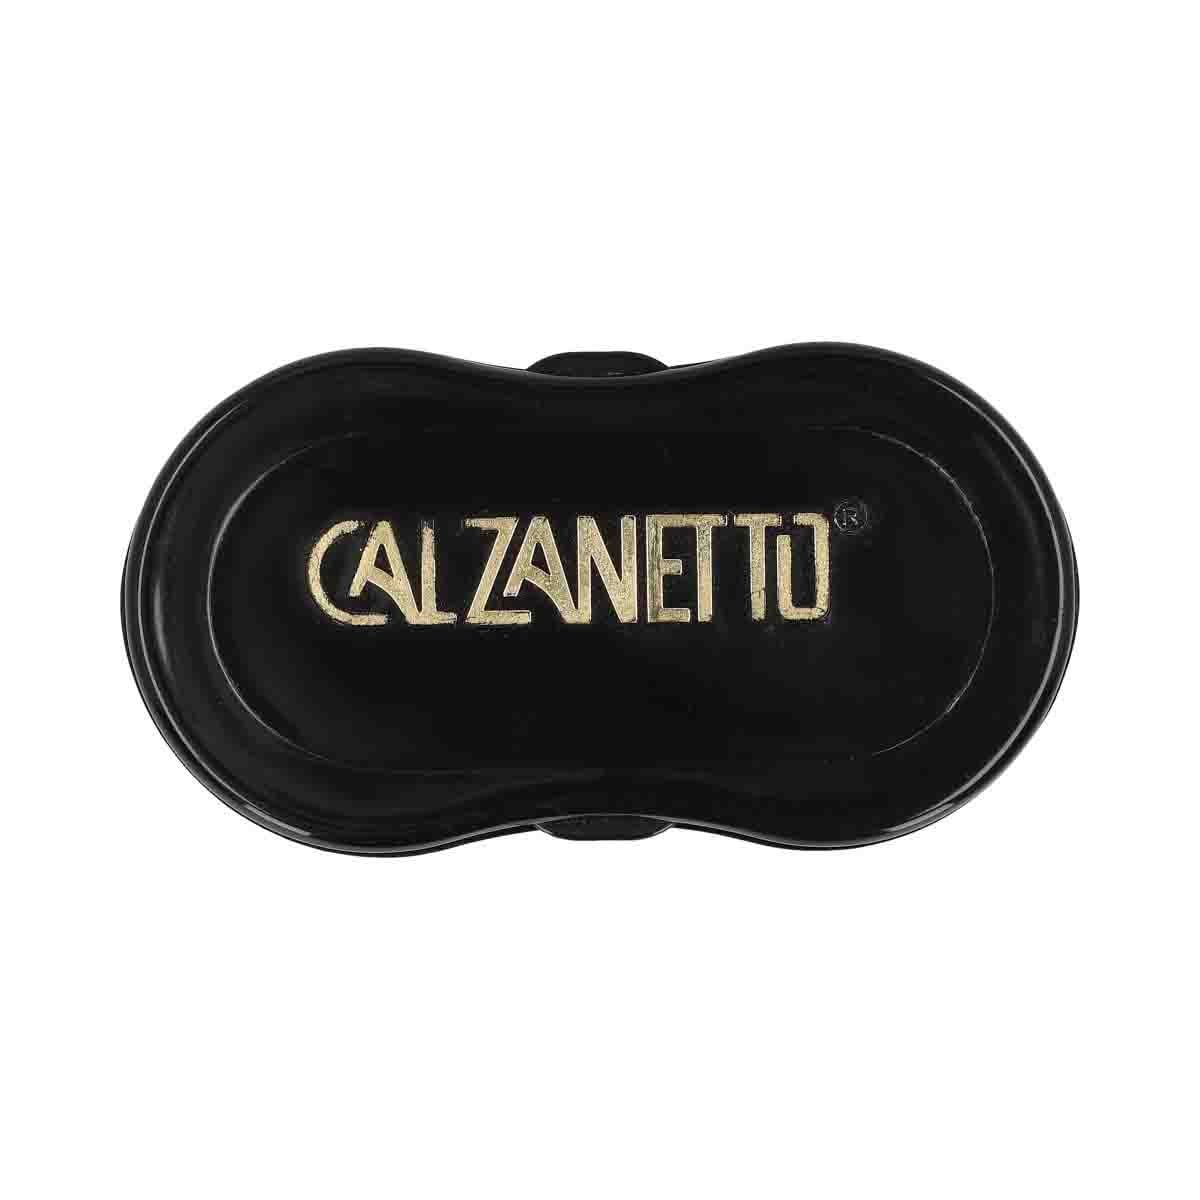 Esponja Lusso Negro Calzanetto